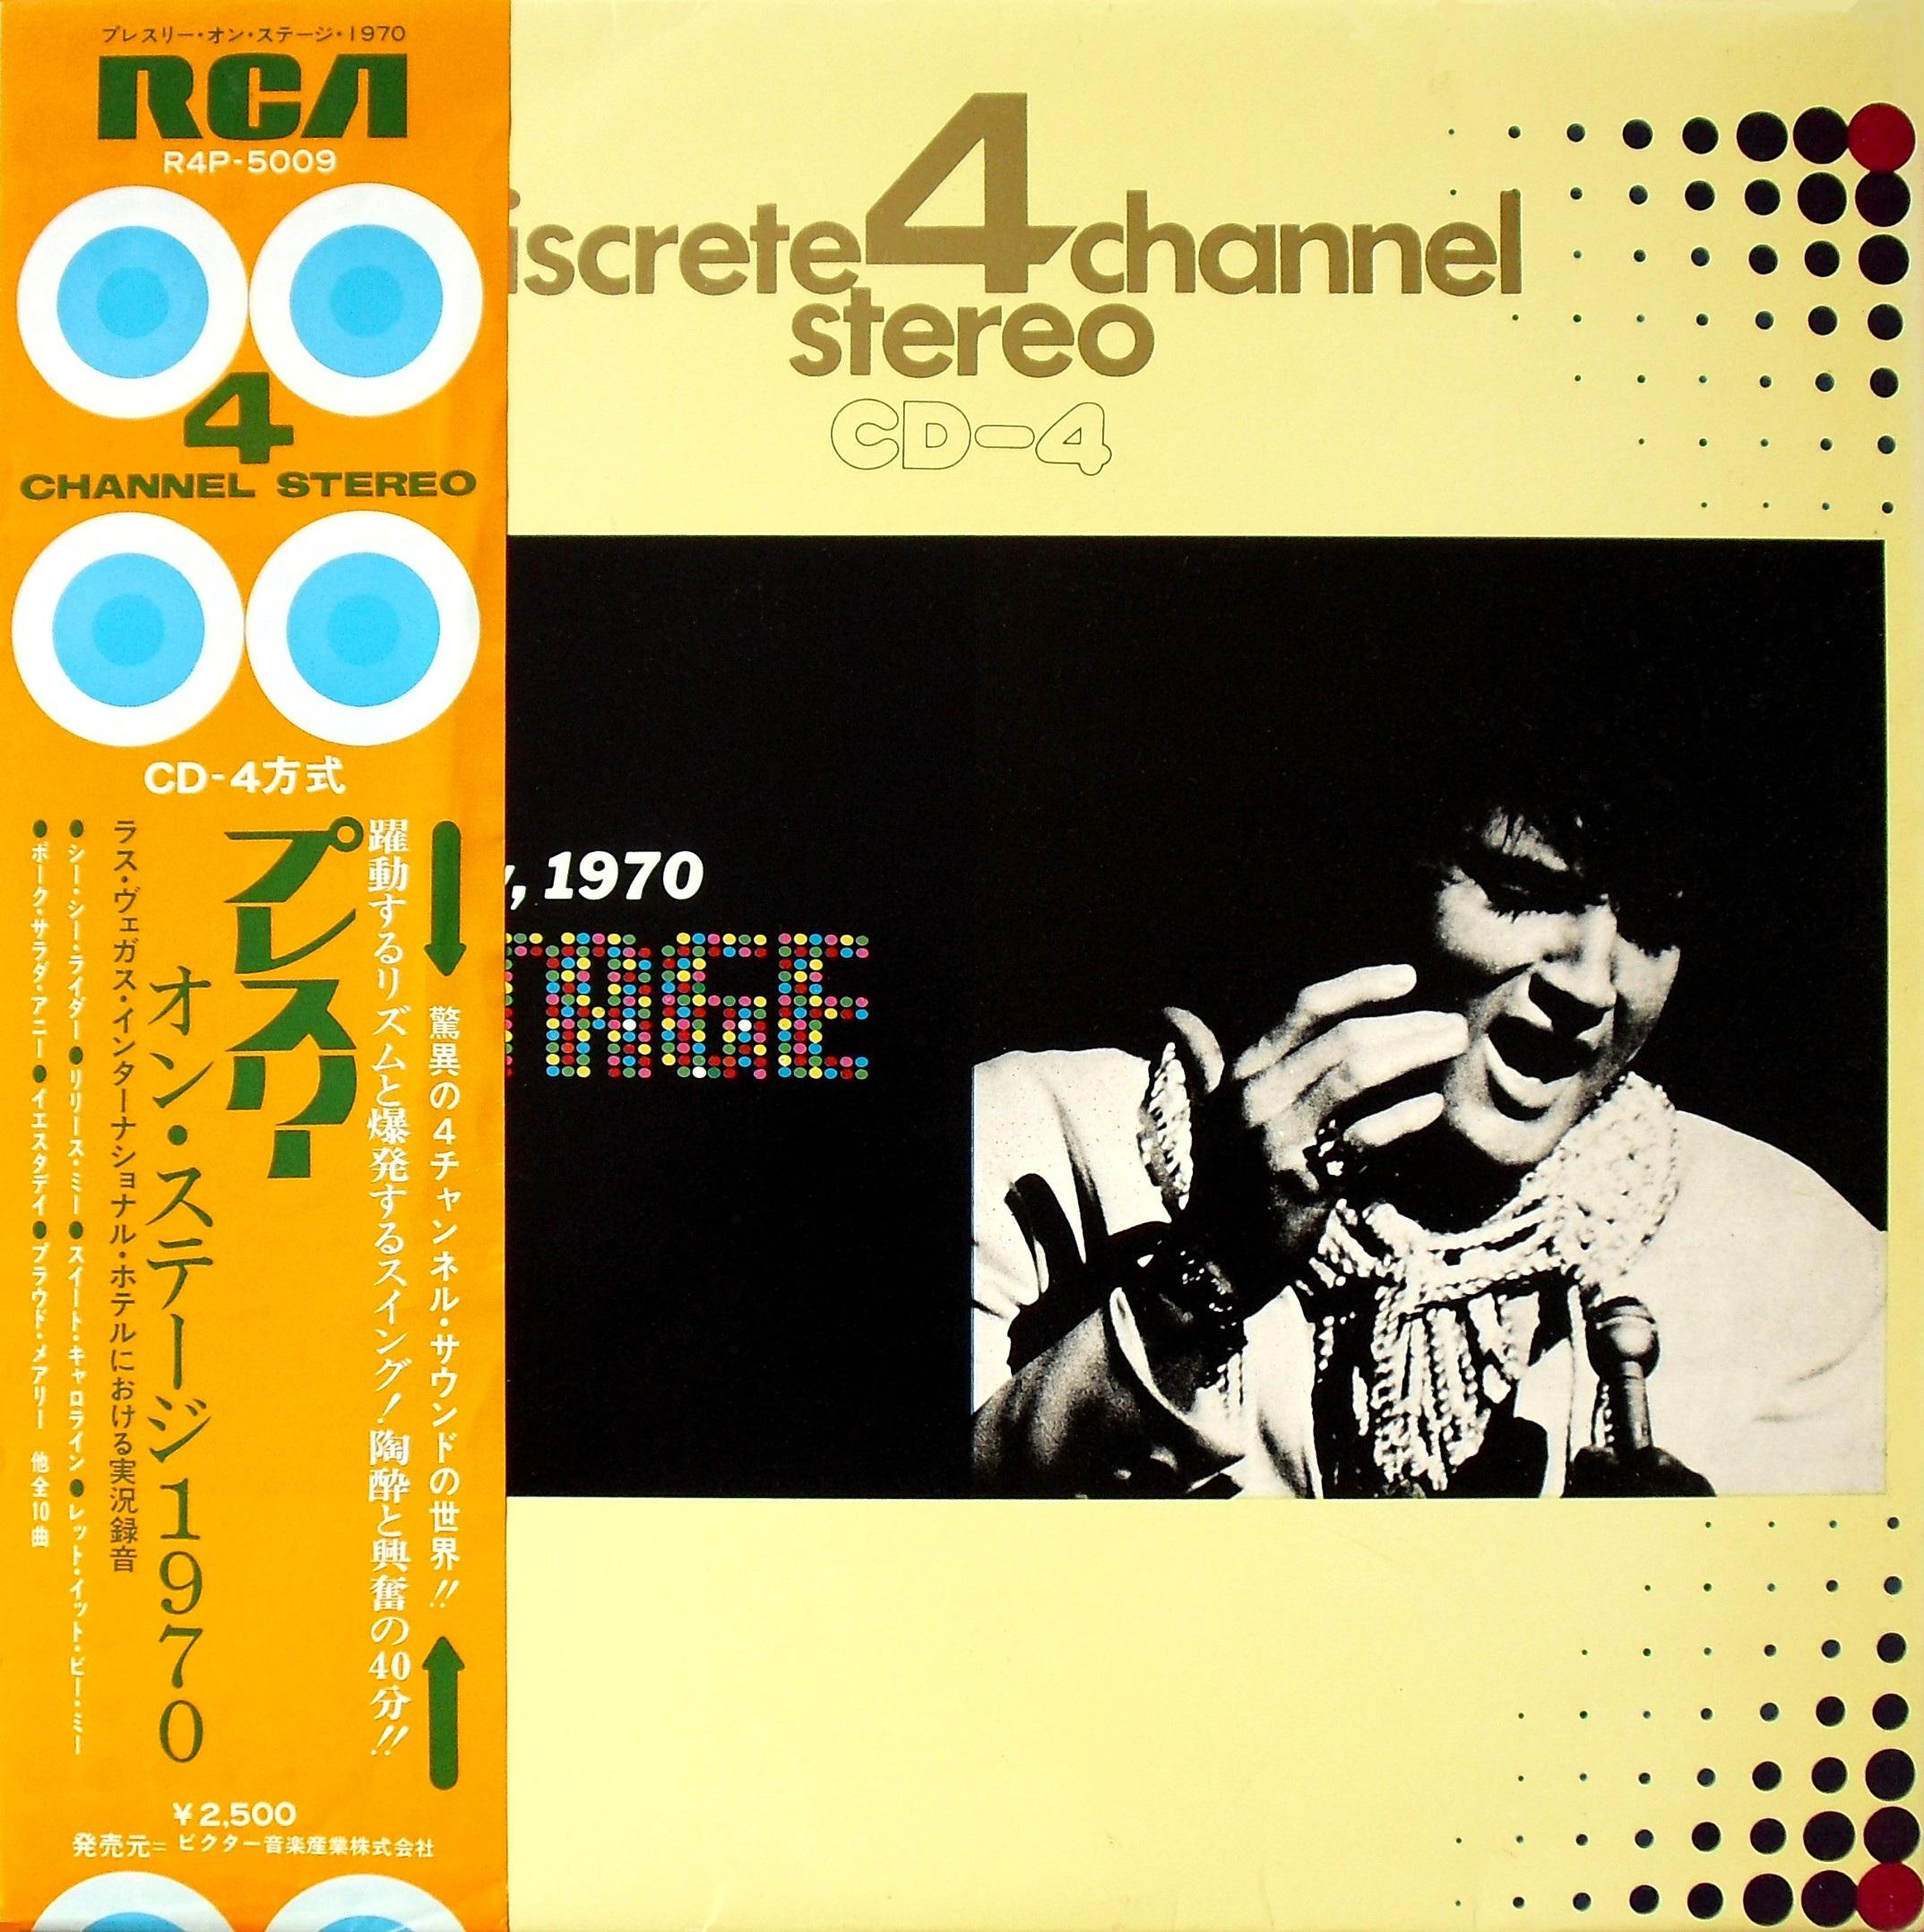 ON STAGE - FEBRUARY, 1970 01jyuz8